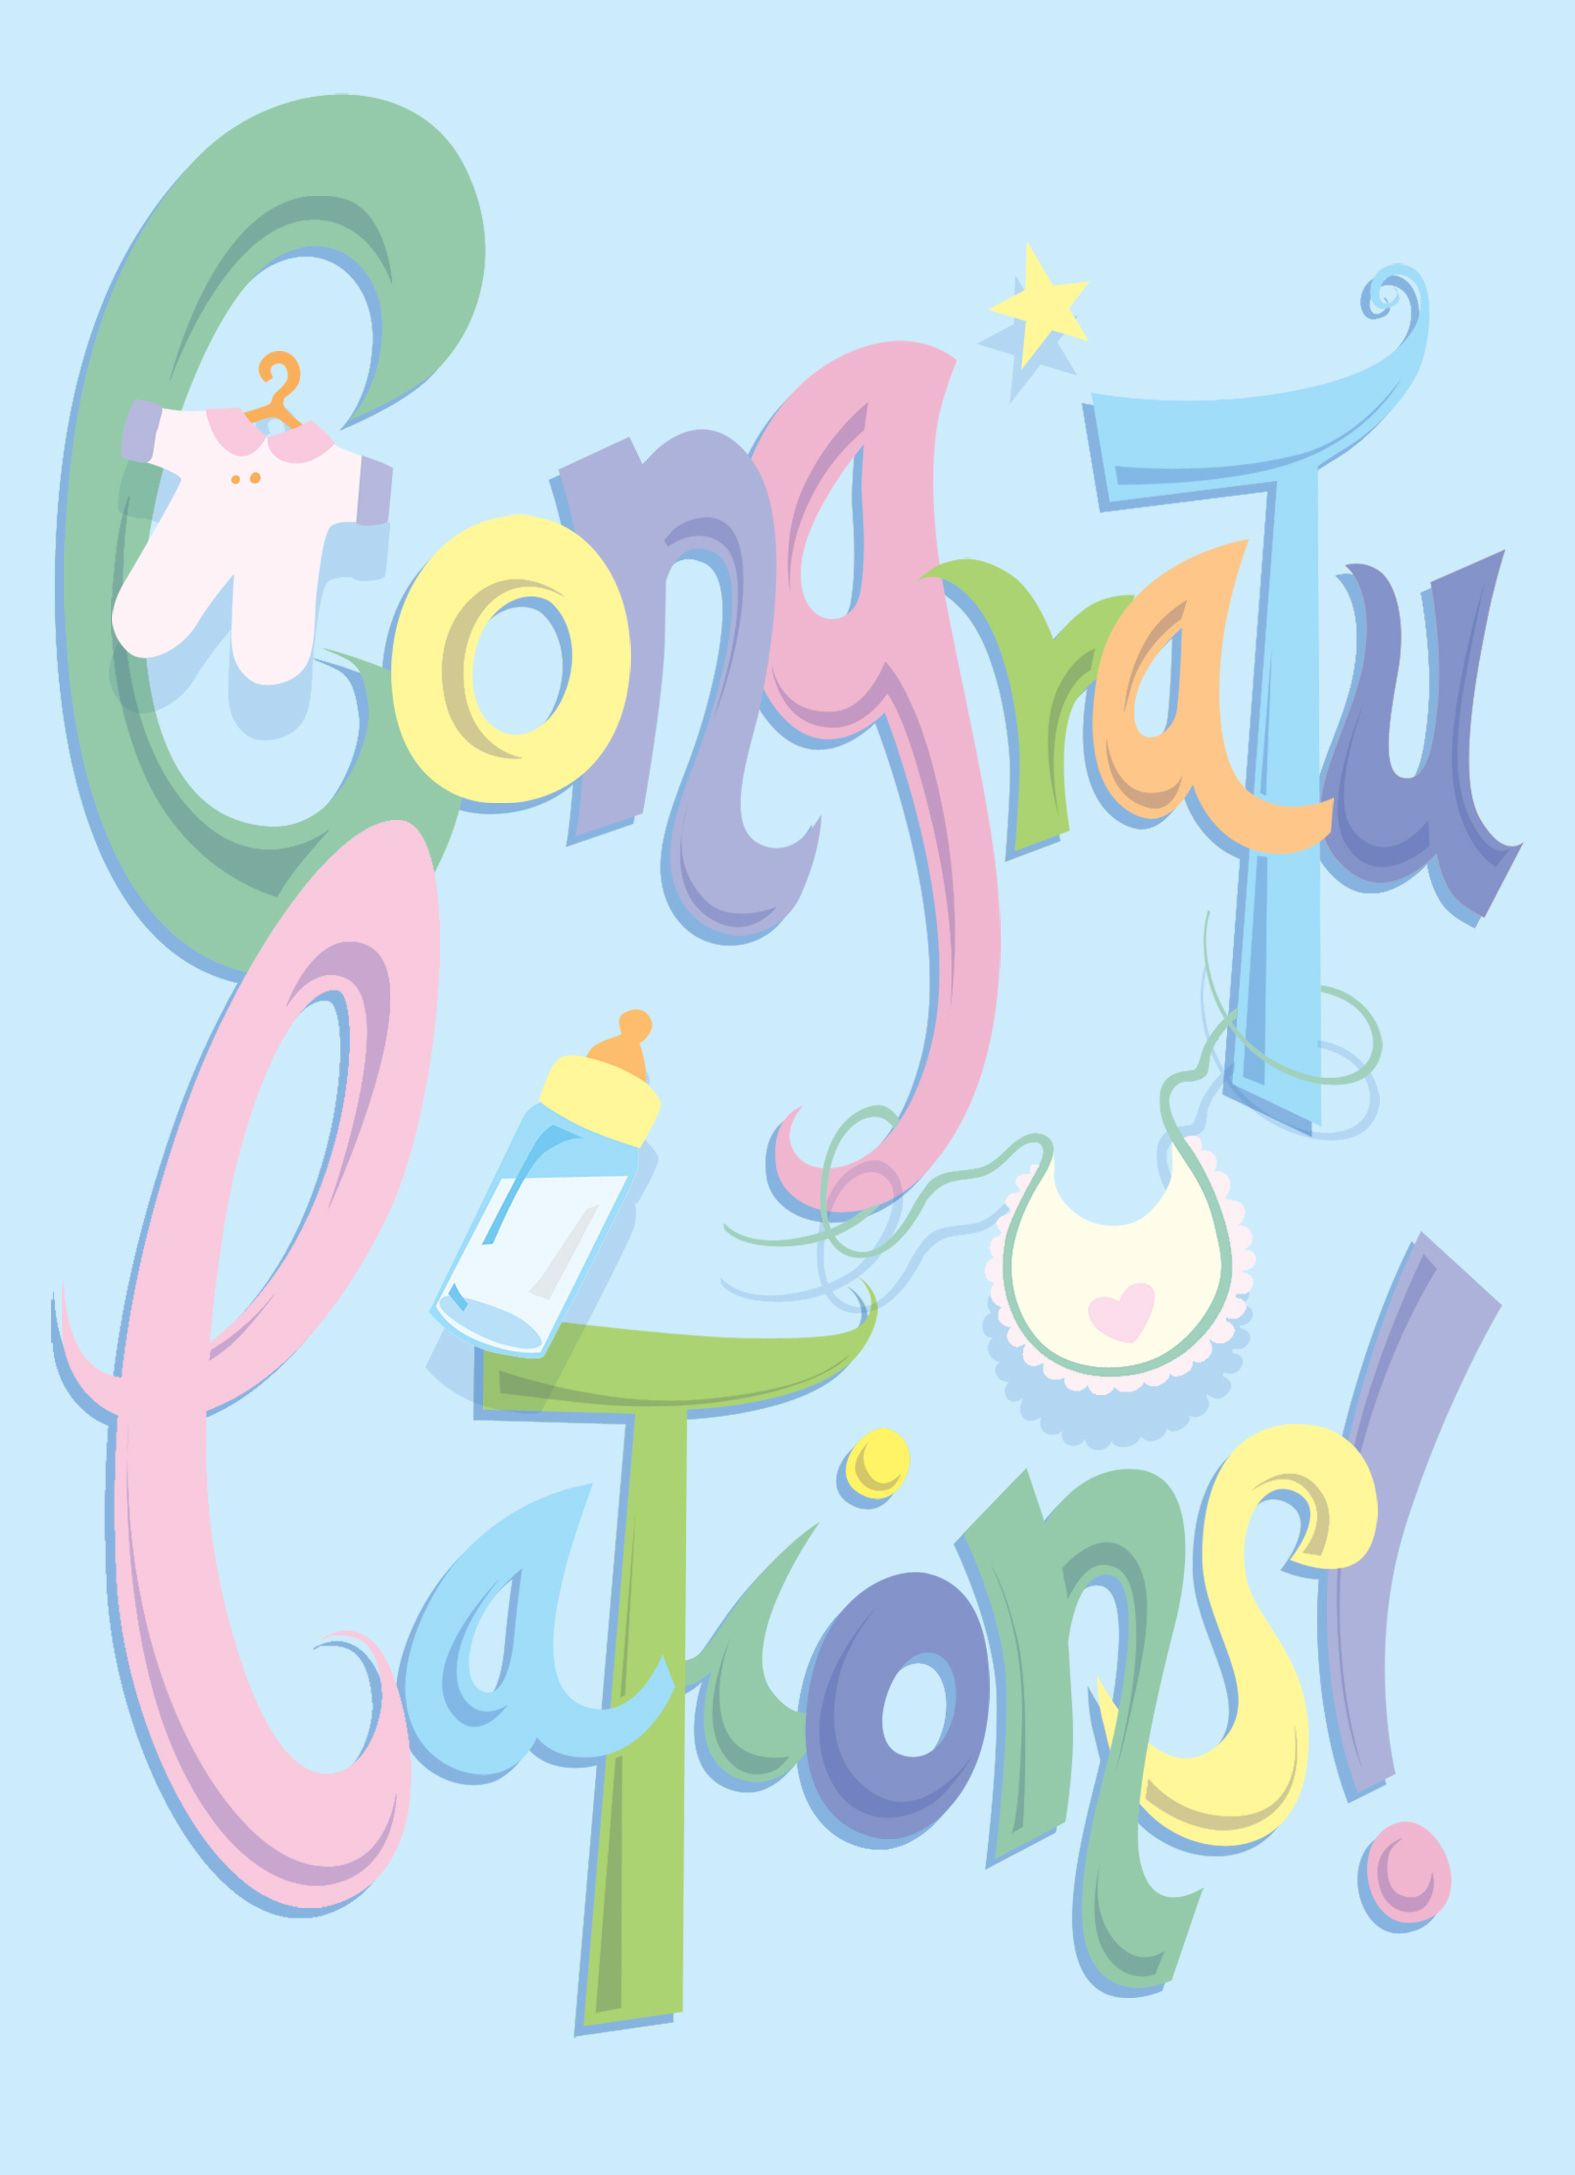 Fullsize Of Congrats On Baby